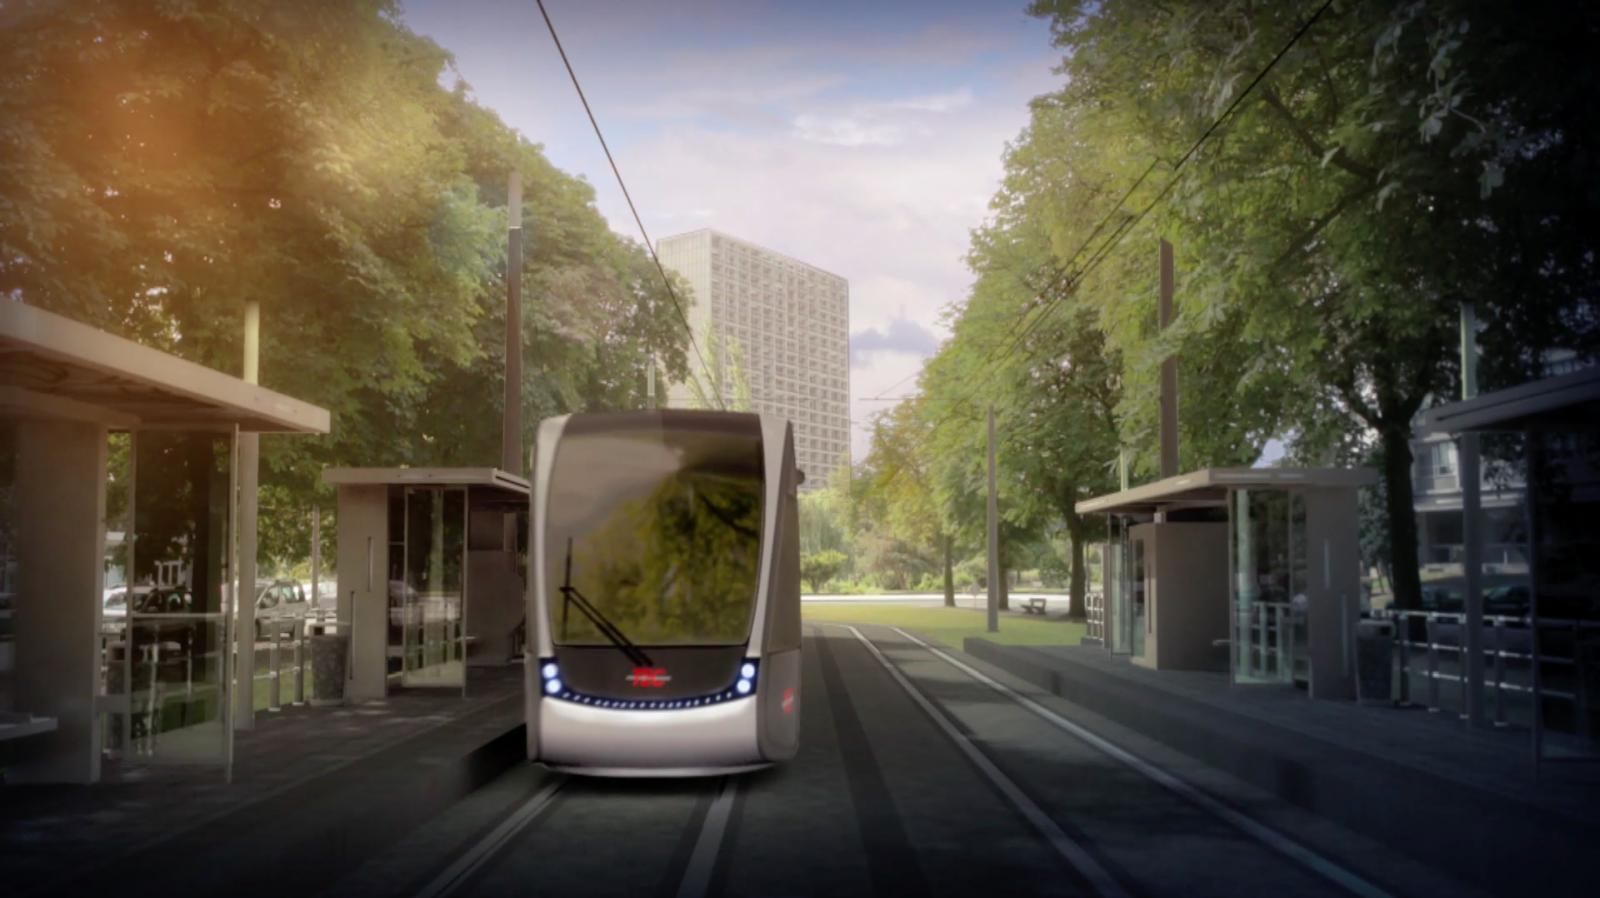 Colas team wins Liège tramway tender